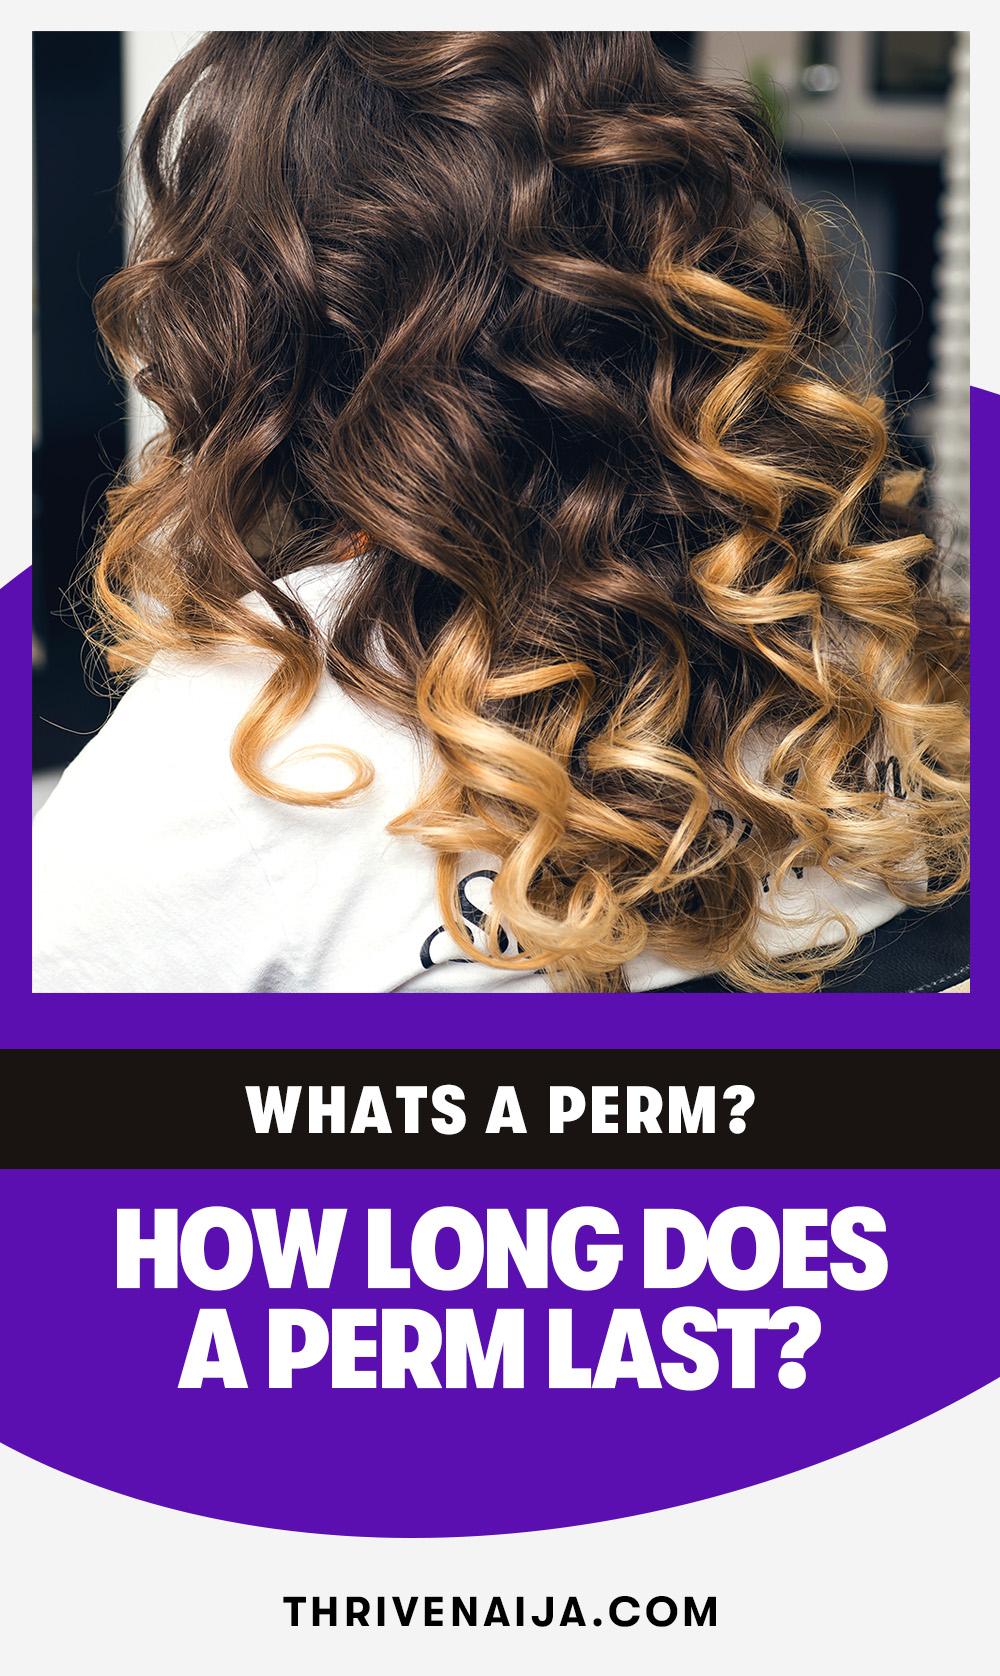 How long does a perm last?